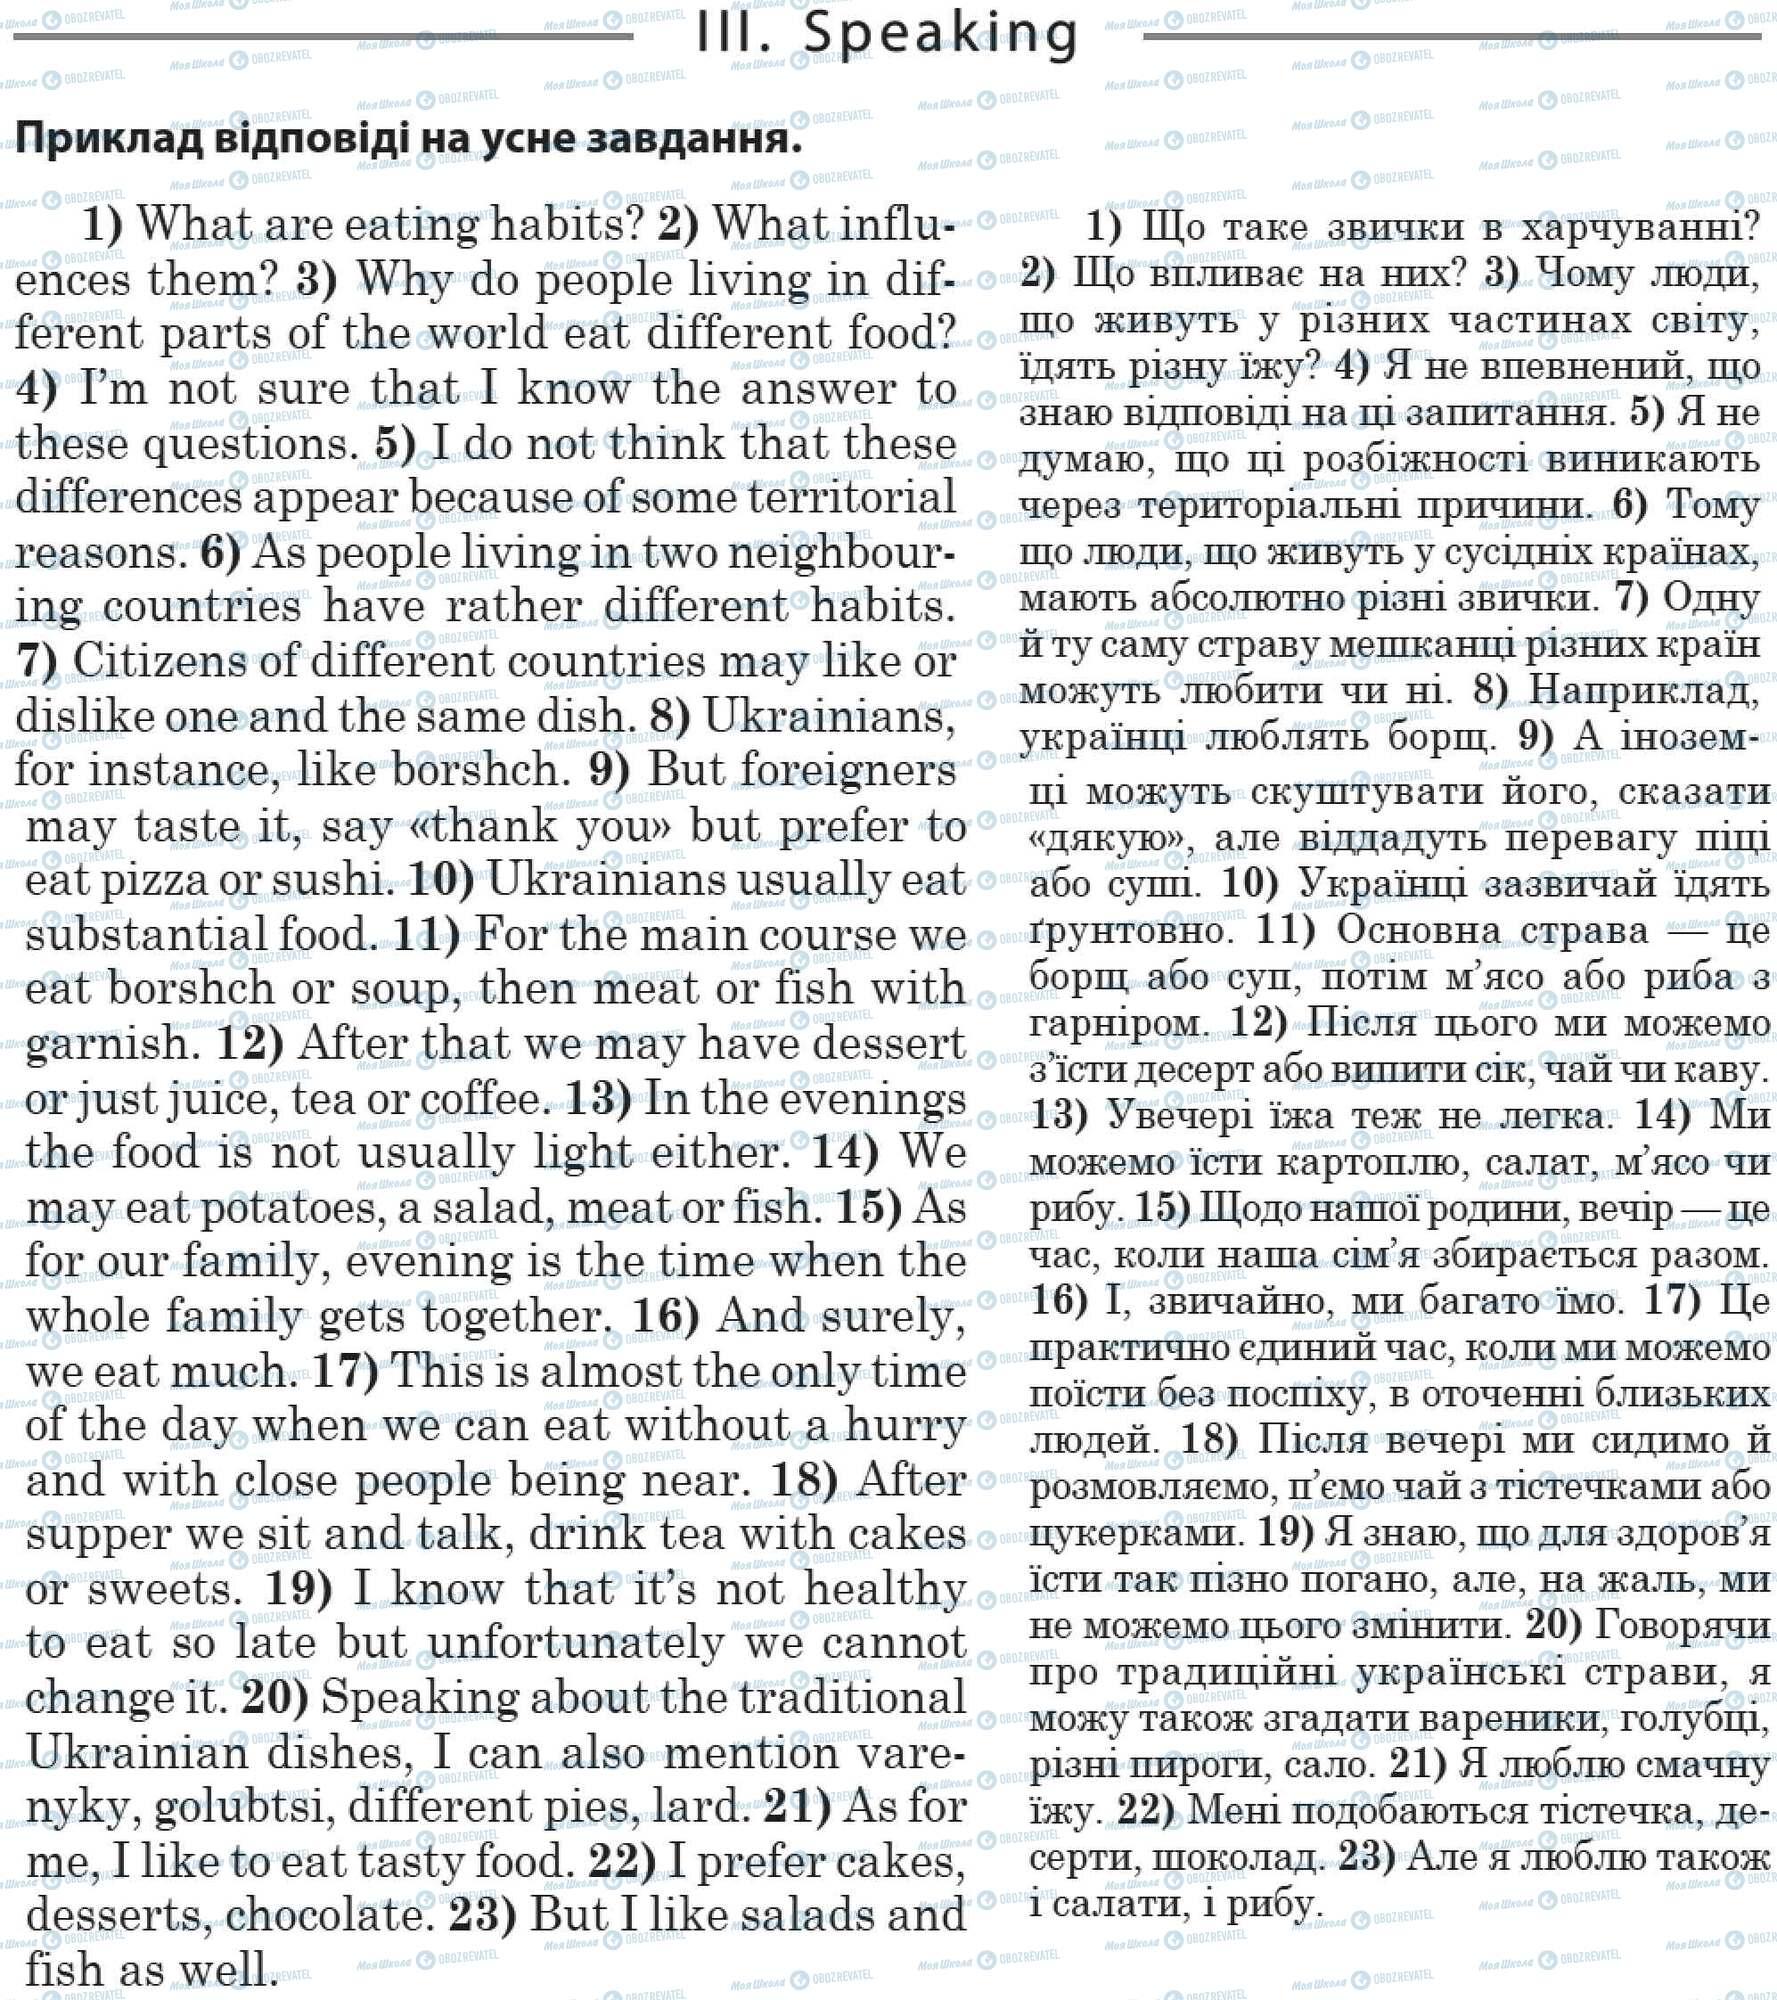 ДПА Английский язык 11 класс страница 3. Speaking